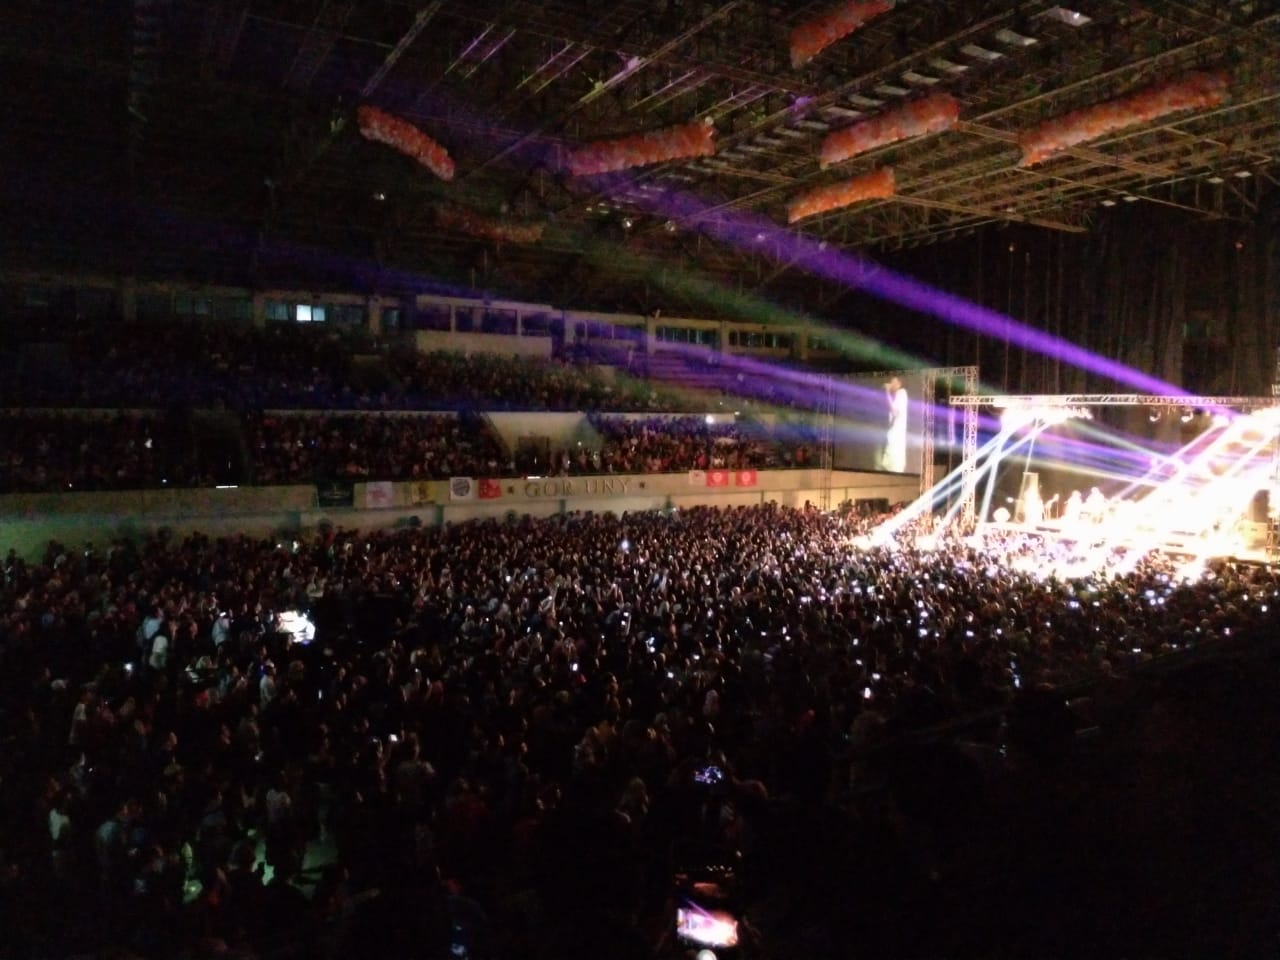 Kesuksesan Pergelaran Konser #RomanticTunes5 Bersama SHEILA ON 7 dan LETTO